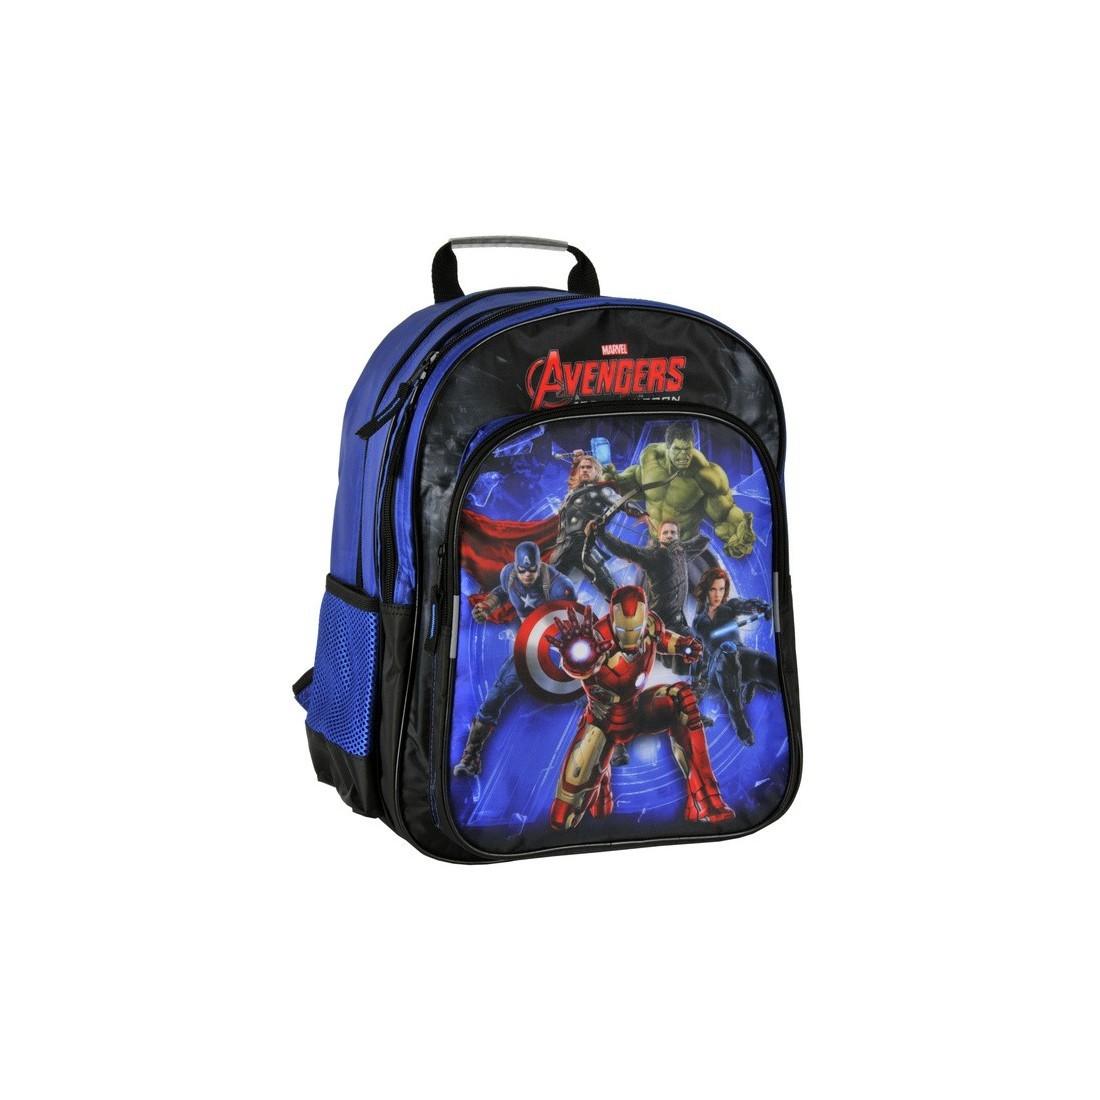 Plecak Avengers granatowy - plecak-tornister.pl